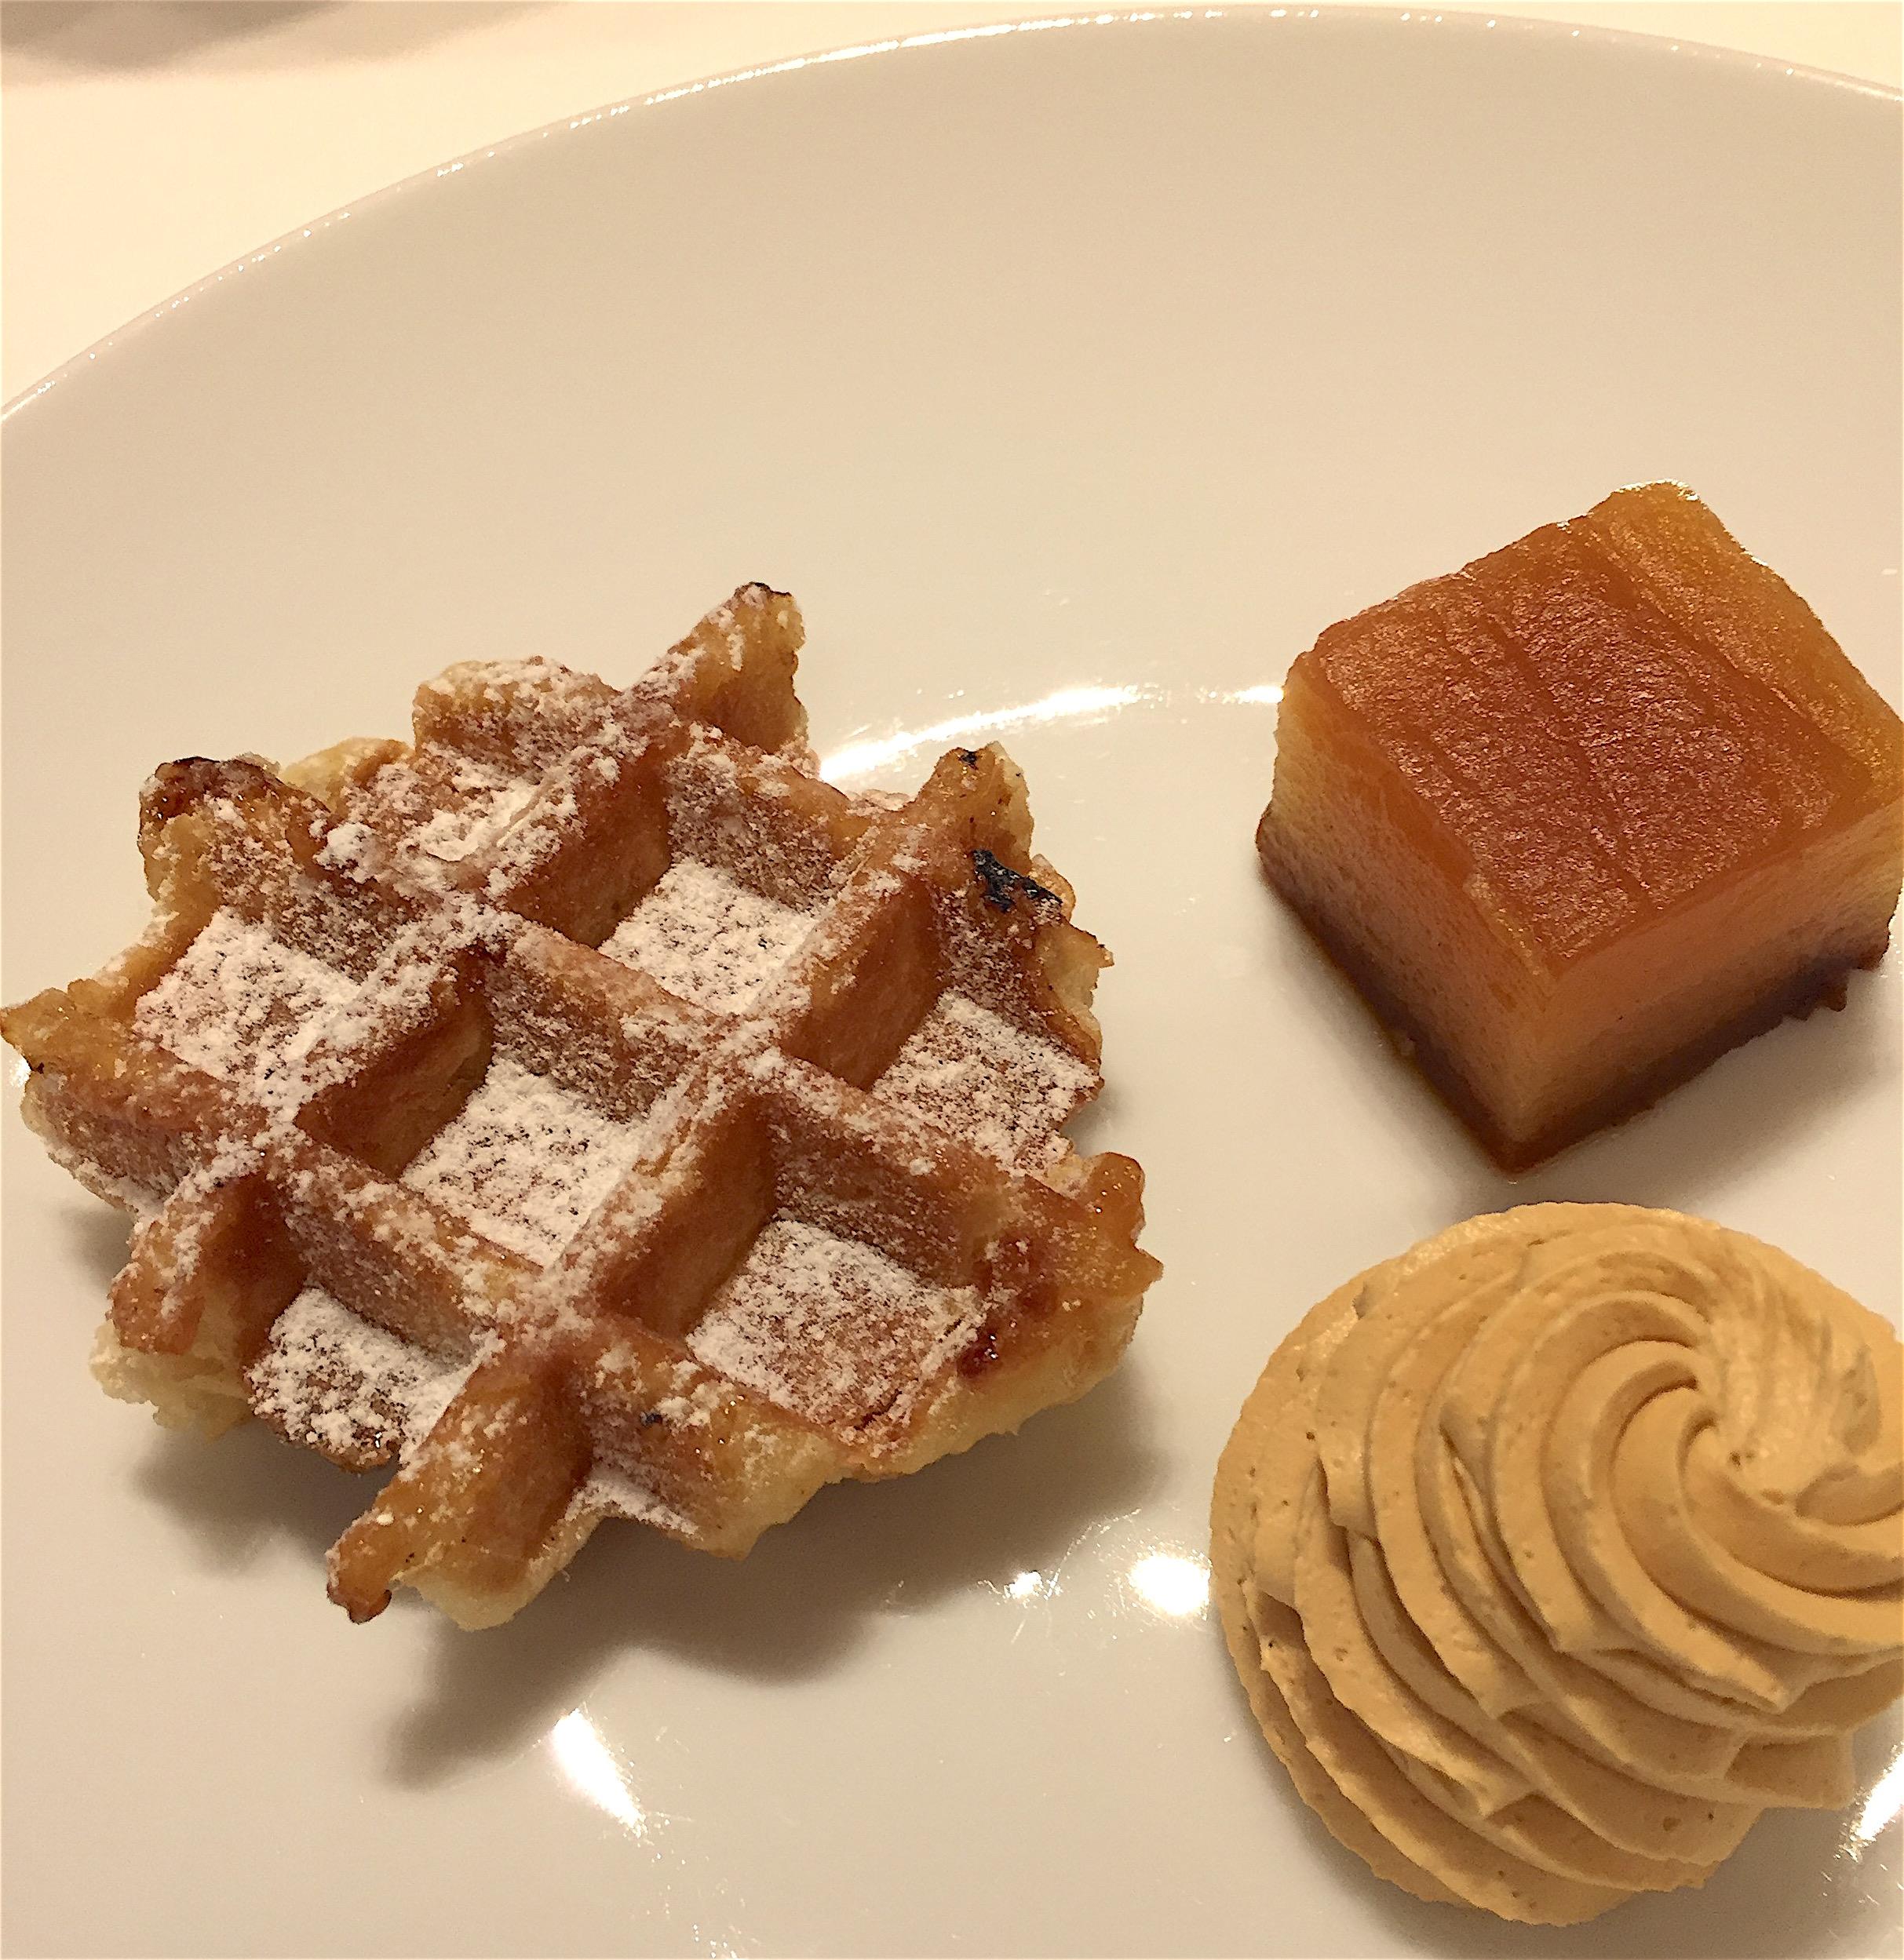 Etolie du Nord - Liege waffle @ Alexander Lobrano